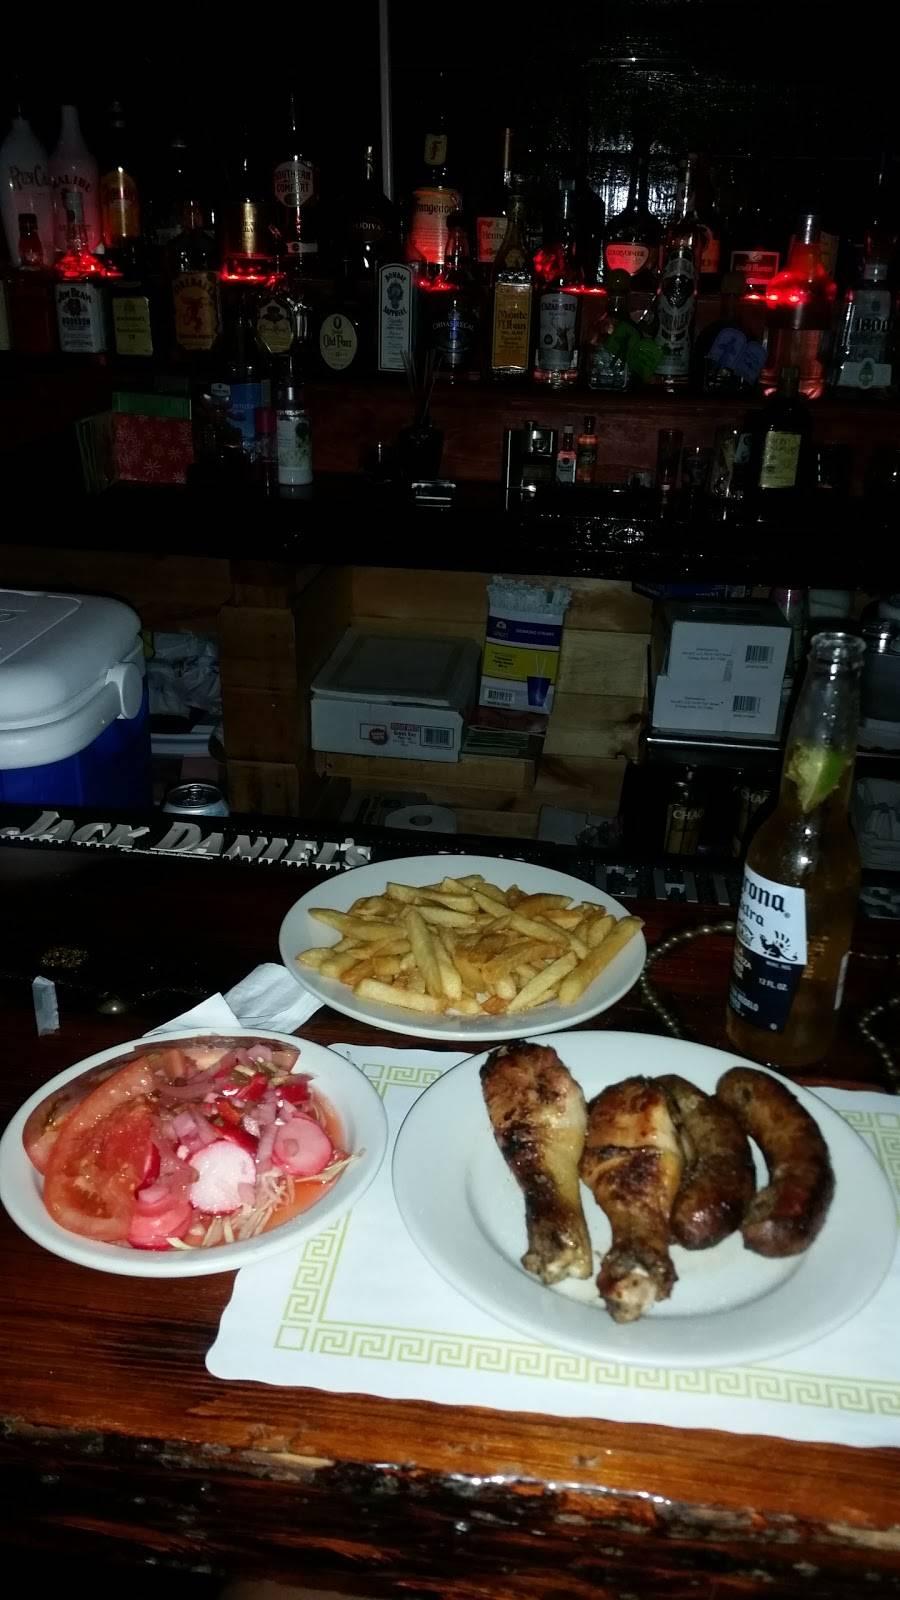 Manhattan Bar and Grill | restaurant | 1711 Manhattan Ave, Union City, NJ 07087, USA | 2016241216 OR +1 201-624-1216